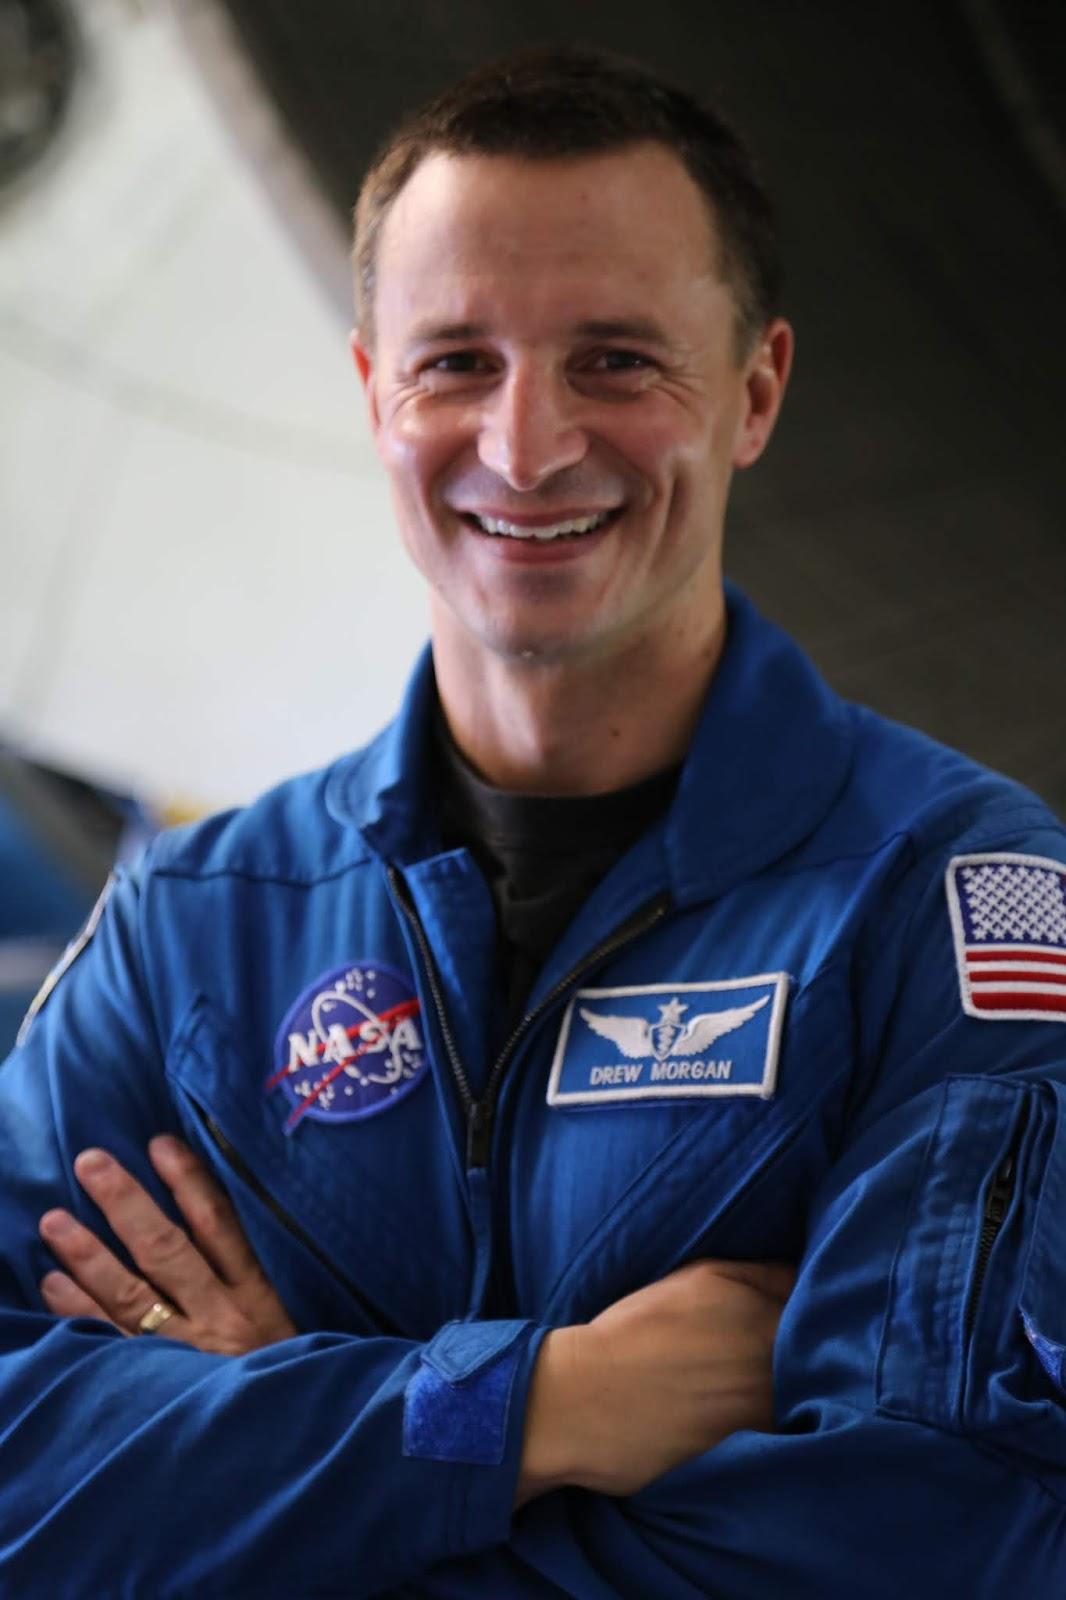 A man in a NASA flight suit